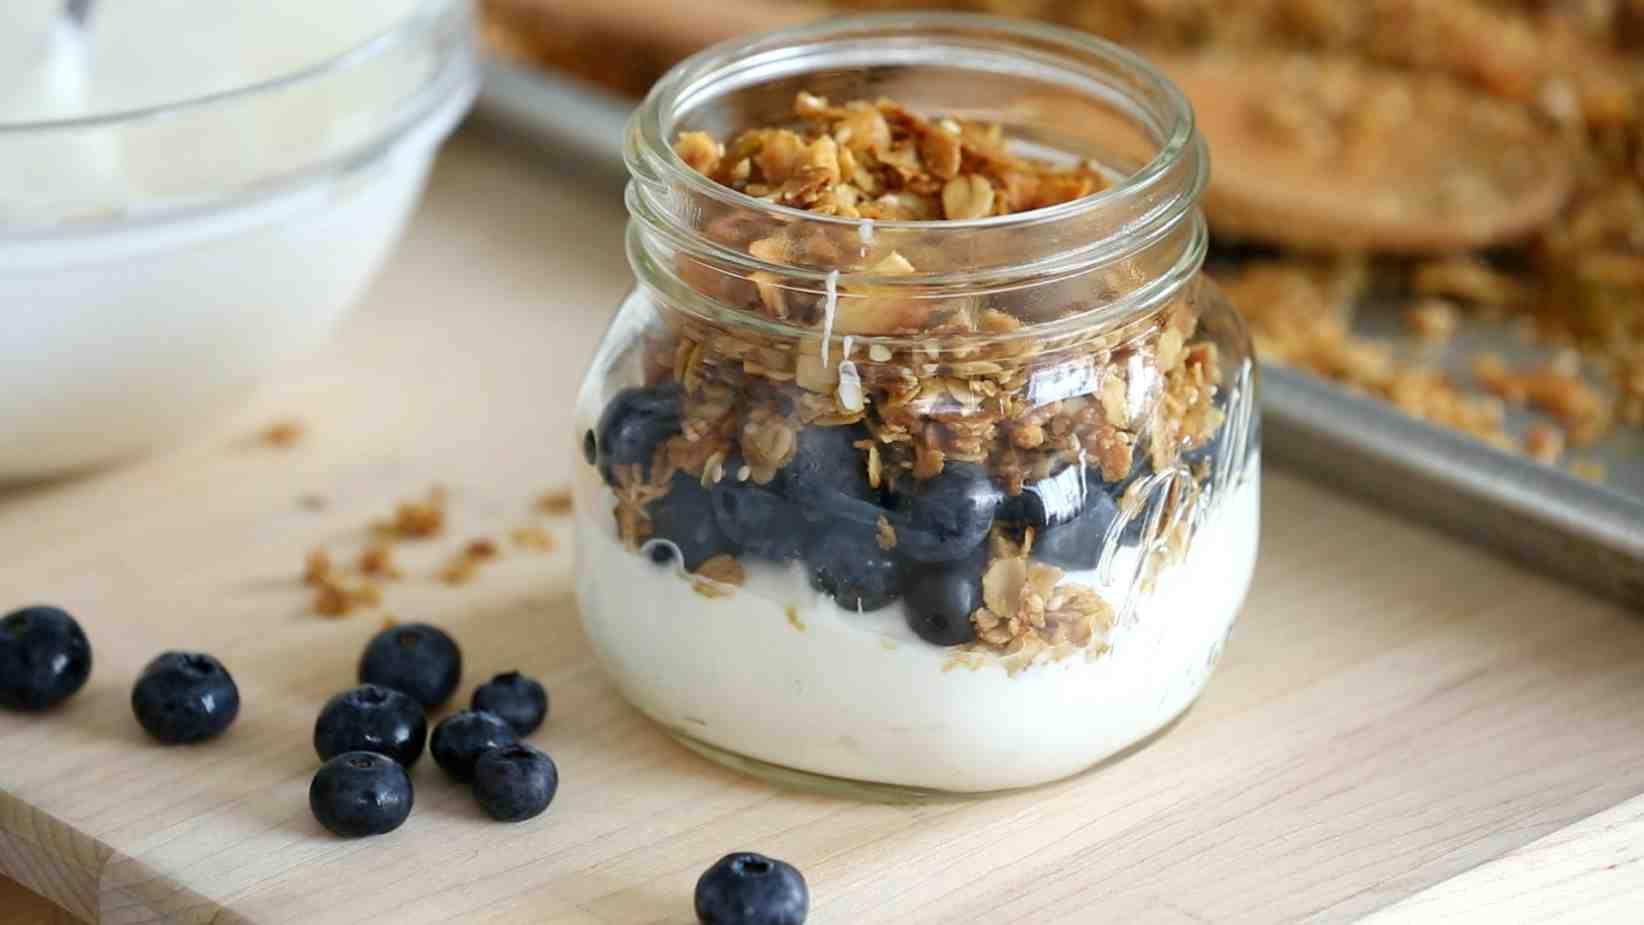 Martha Stewart Cooking | Maple granola recipe, Easy ...